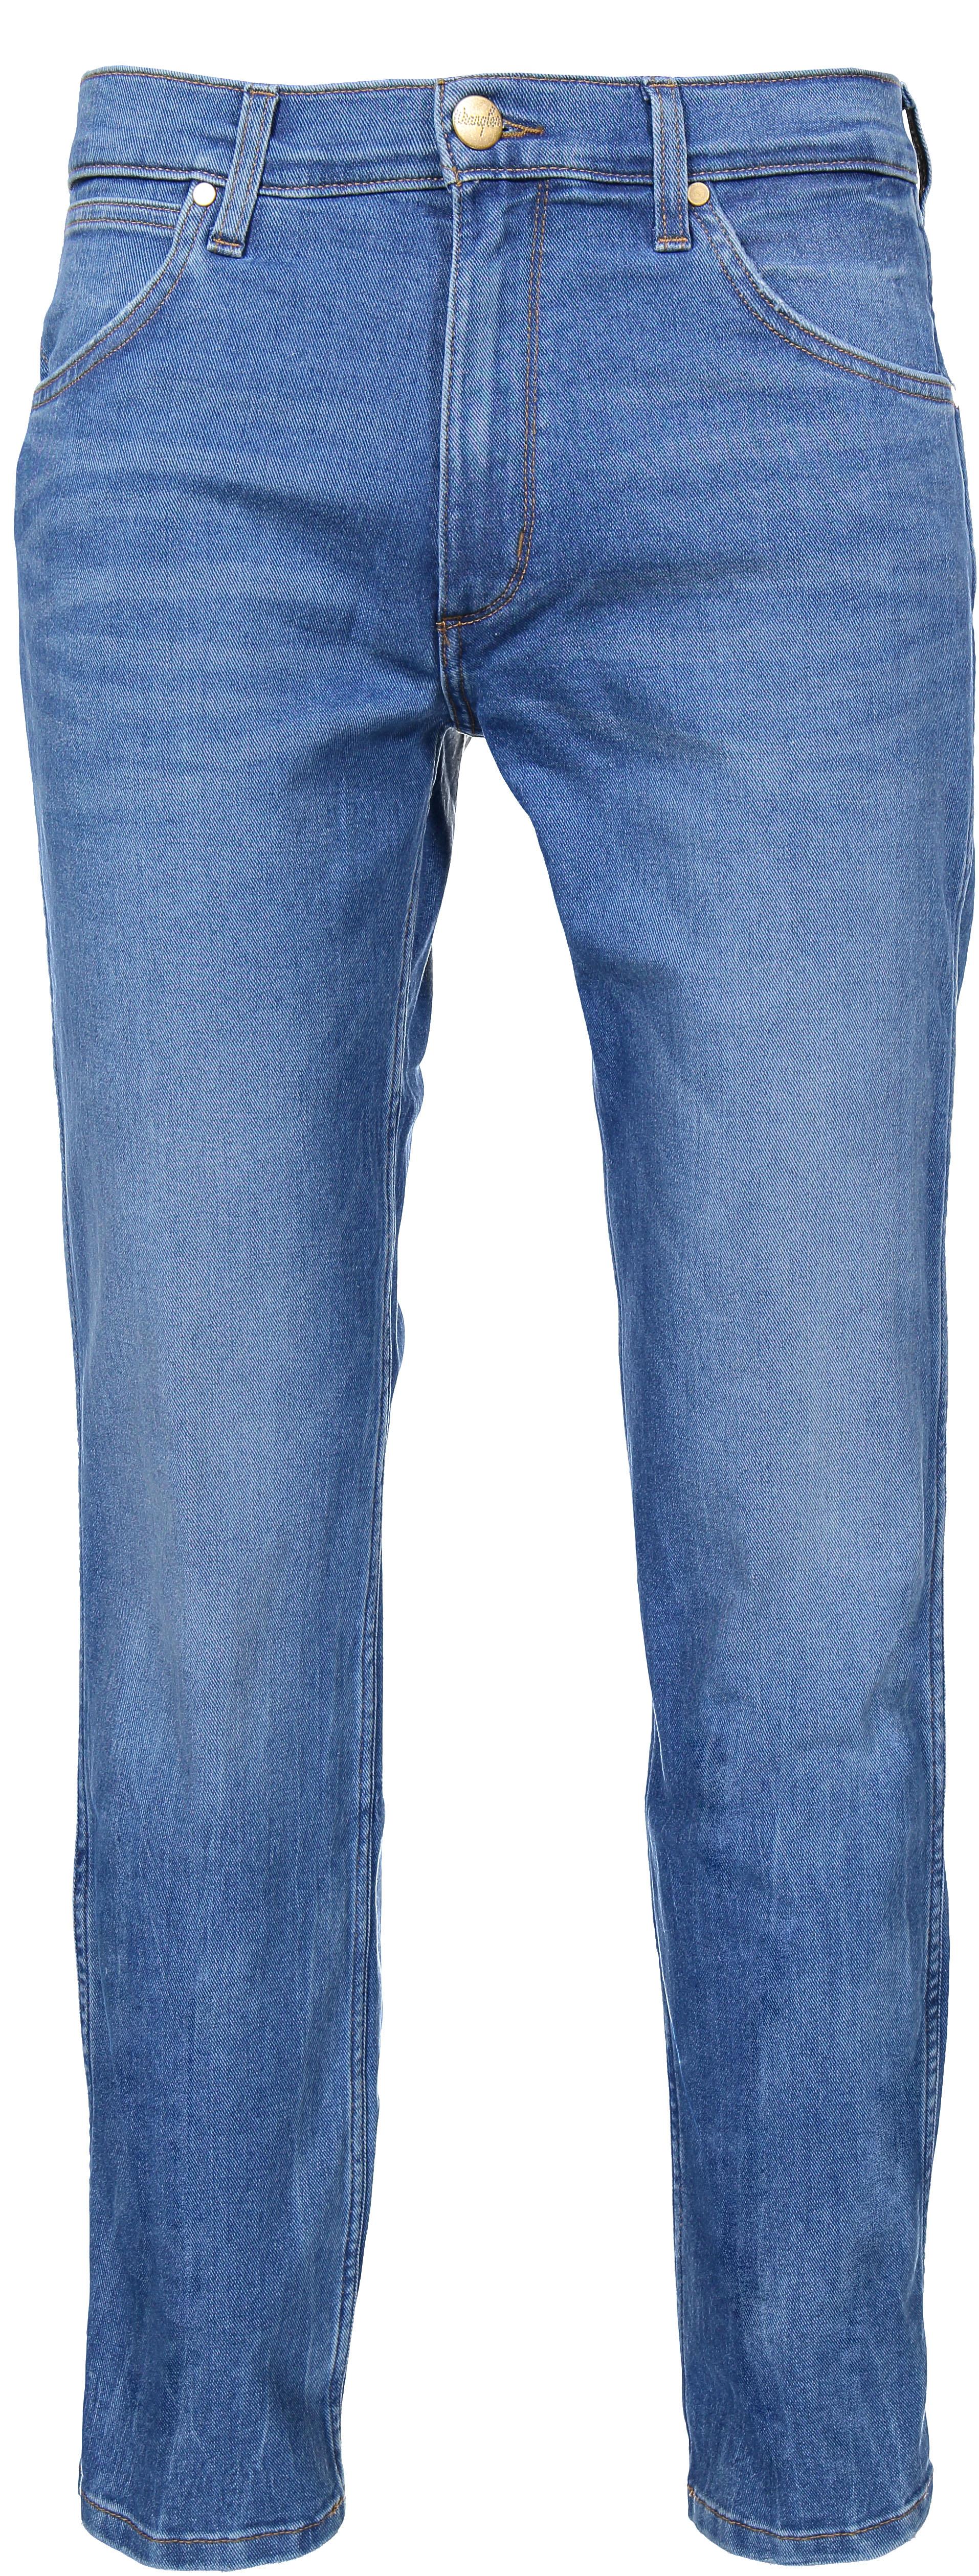 WRANGLER GREENSBORO blue yonder Herren Five Pocket Jeans Used Look W15QQA20Q